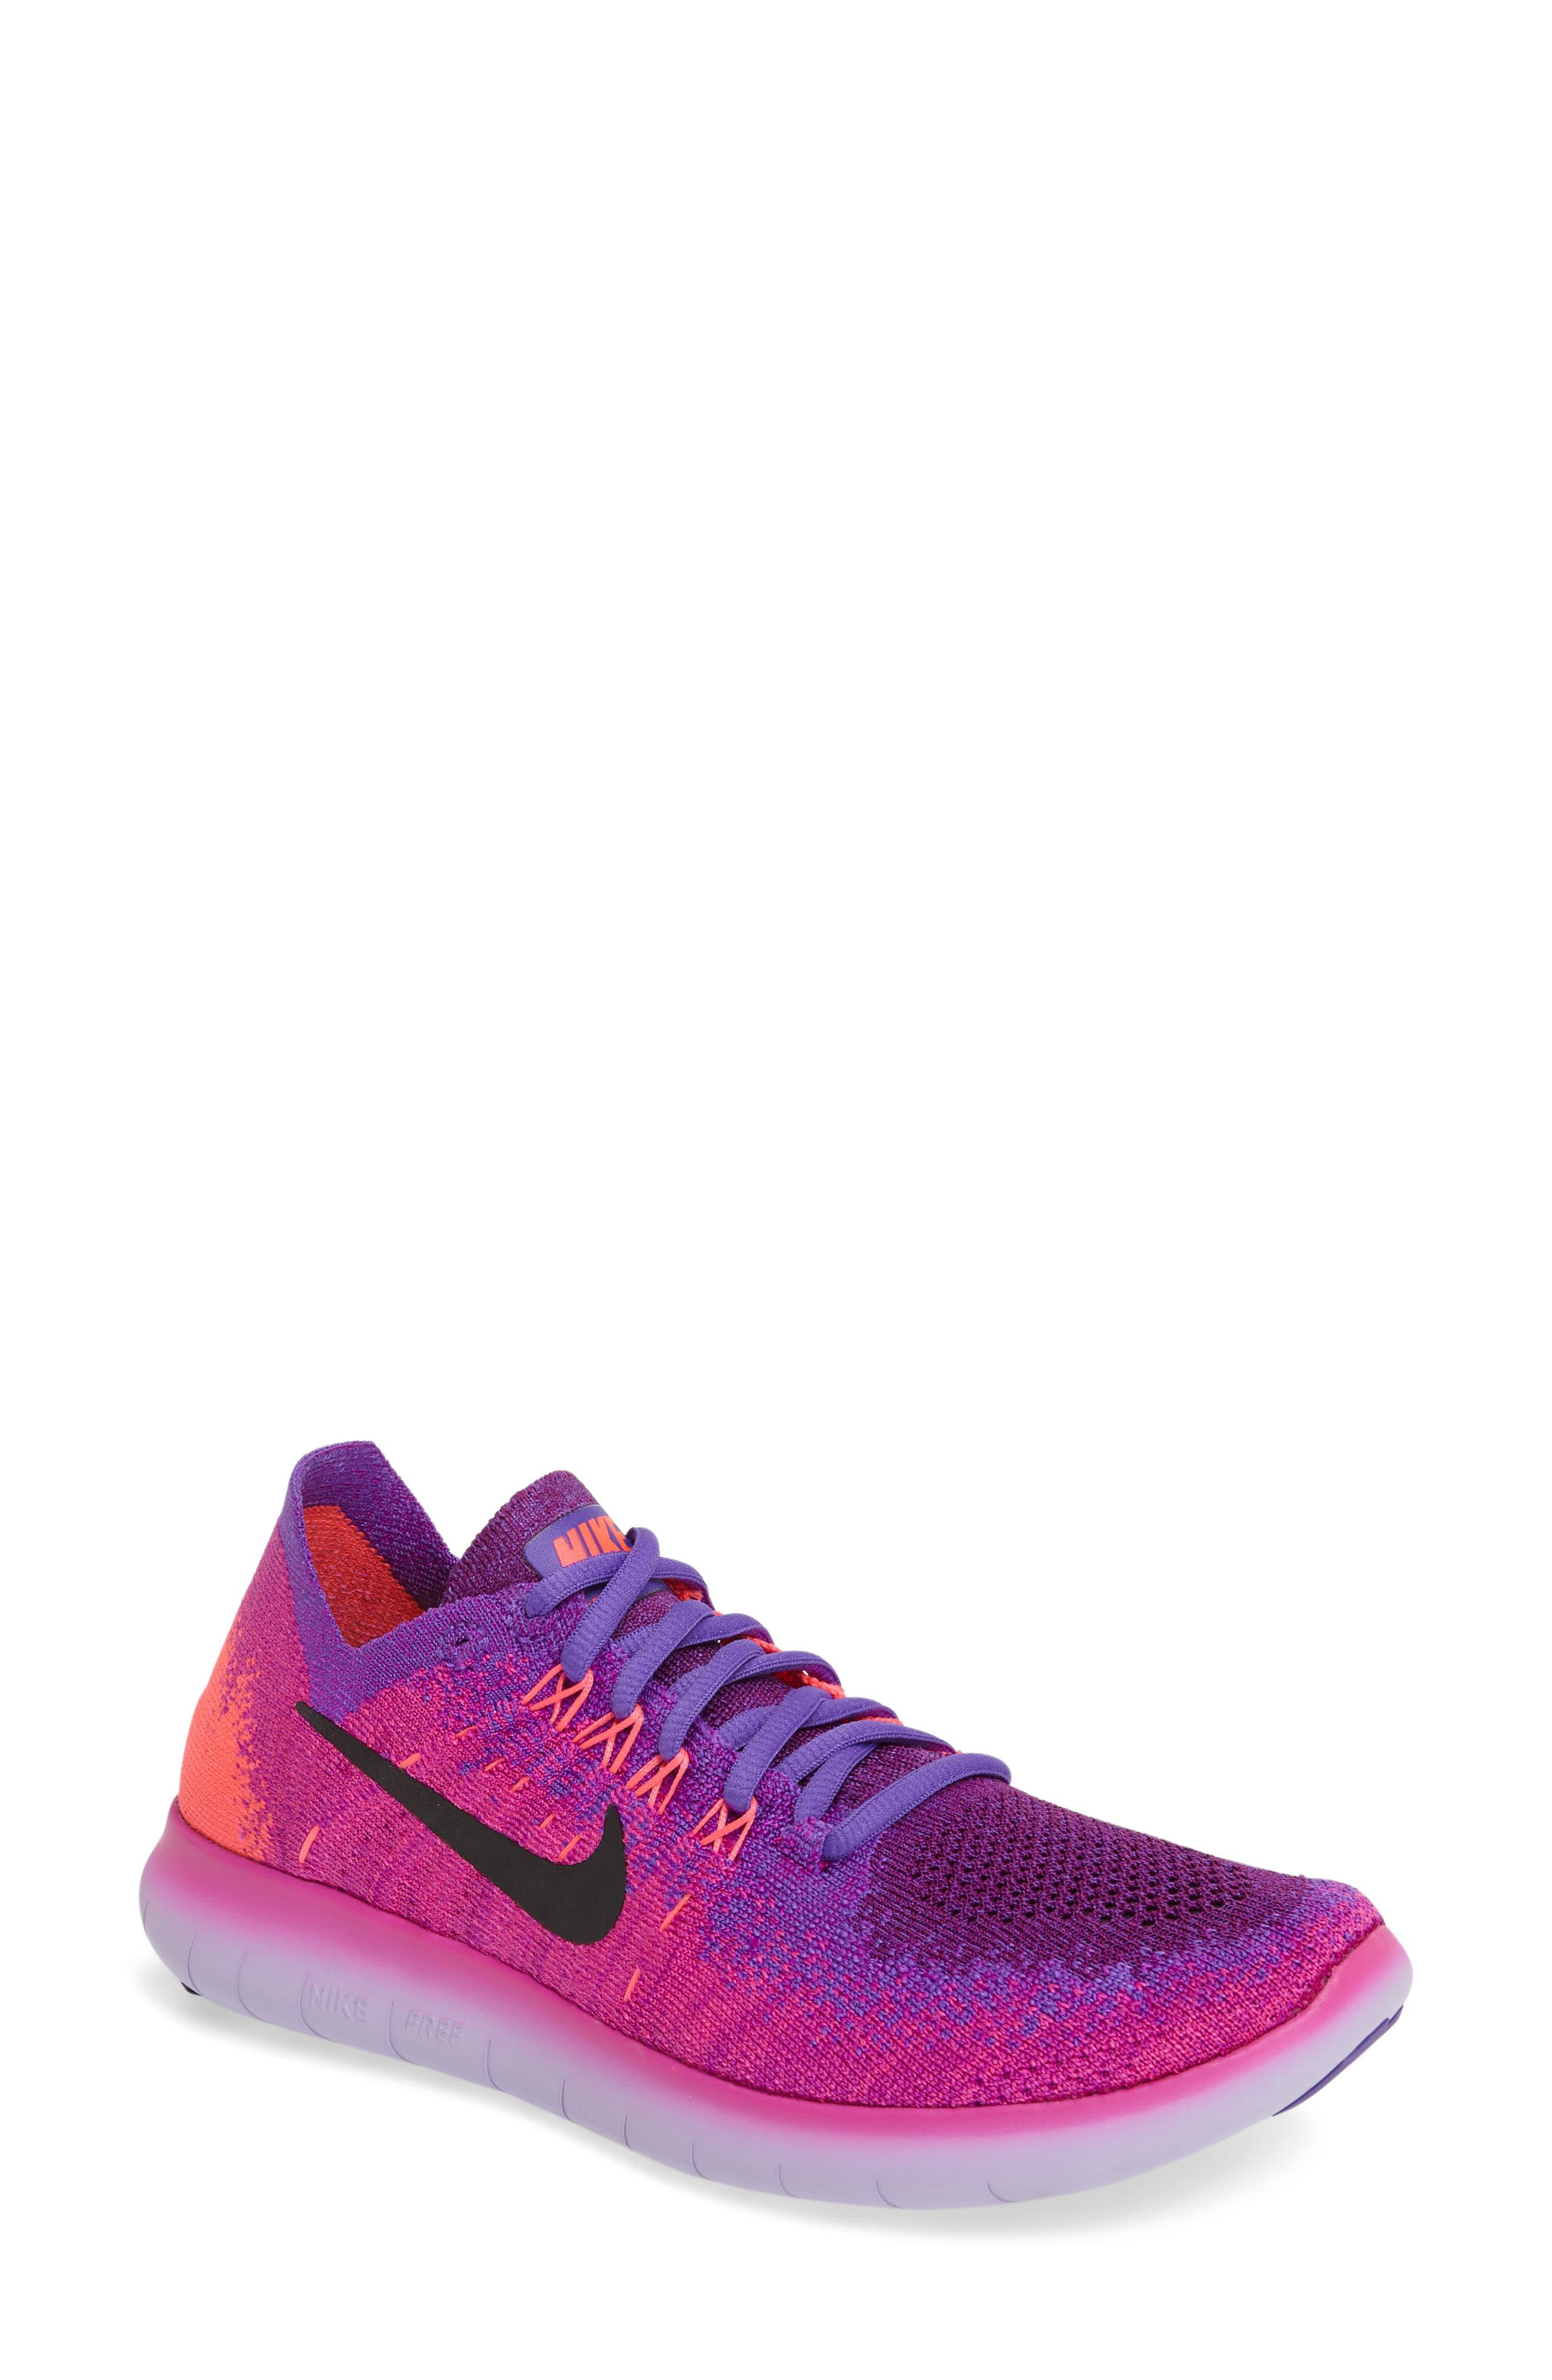 Free RN Flyknit 2 Running Shoe,                         Main,                         color, Pink/ Black/ Hyper Grape